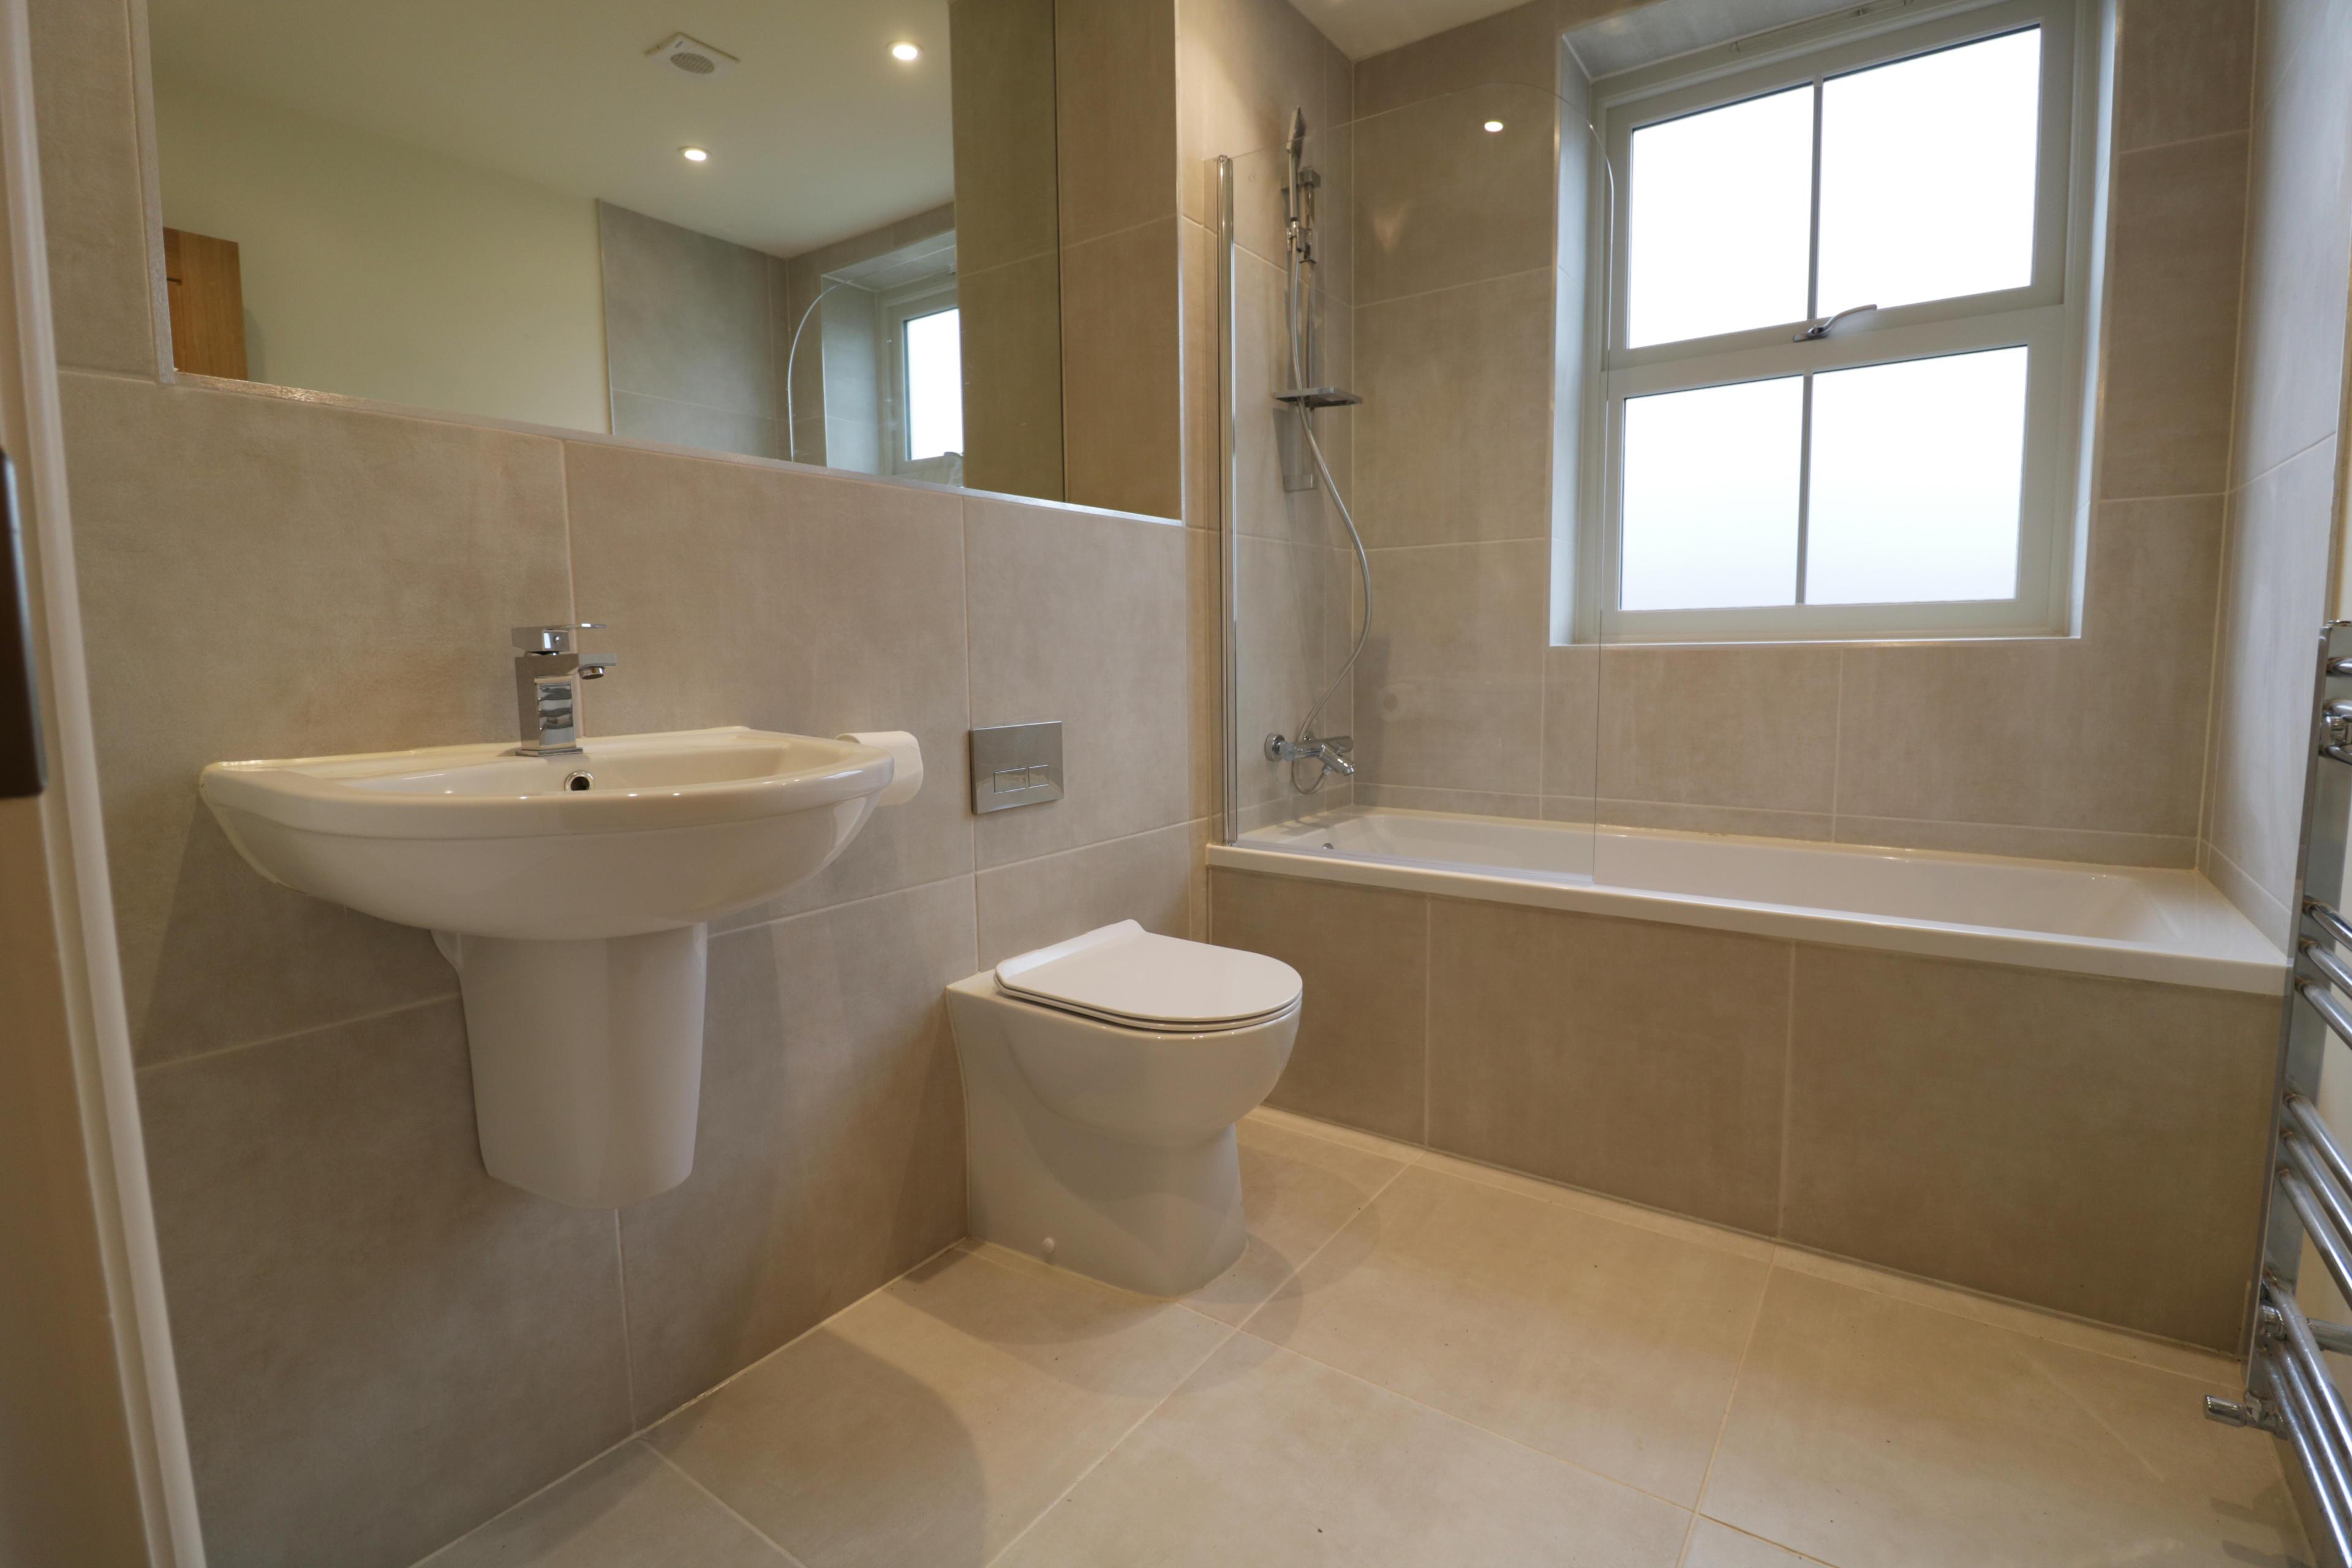 Procter bathroom